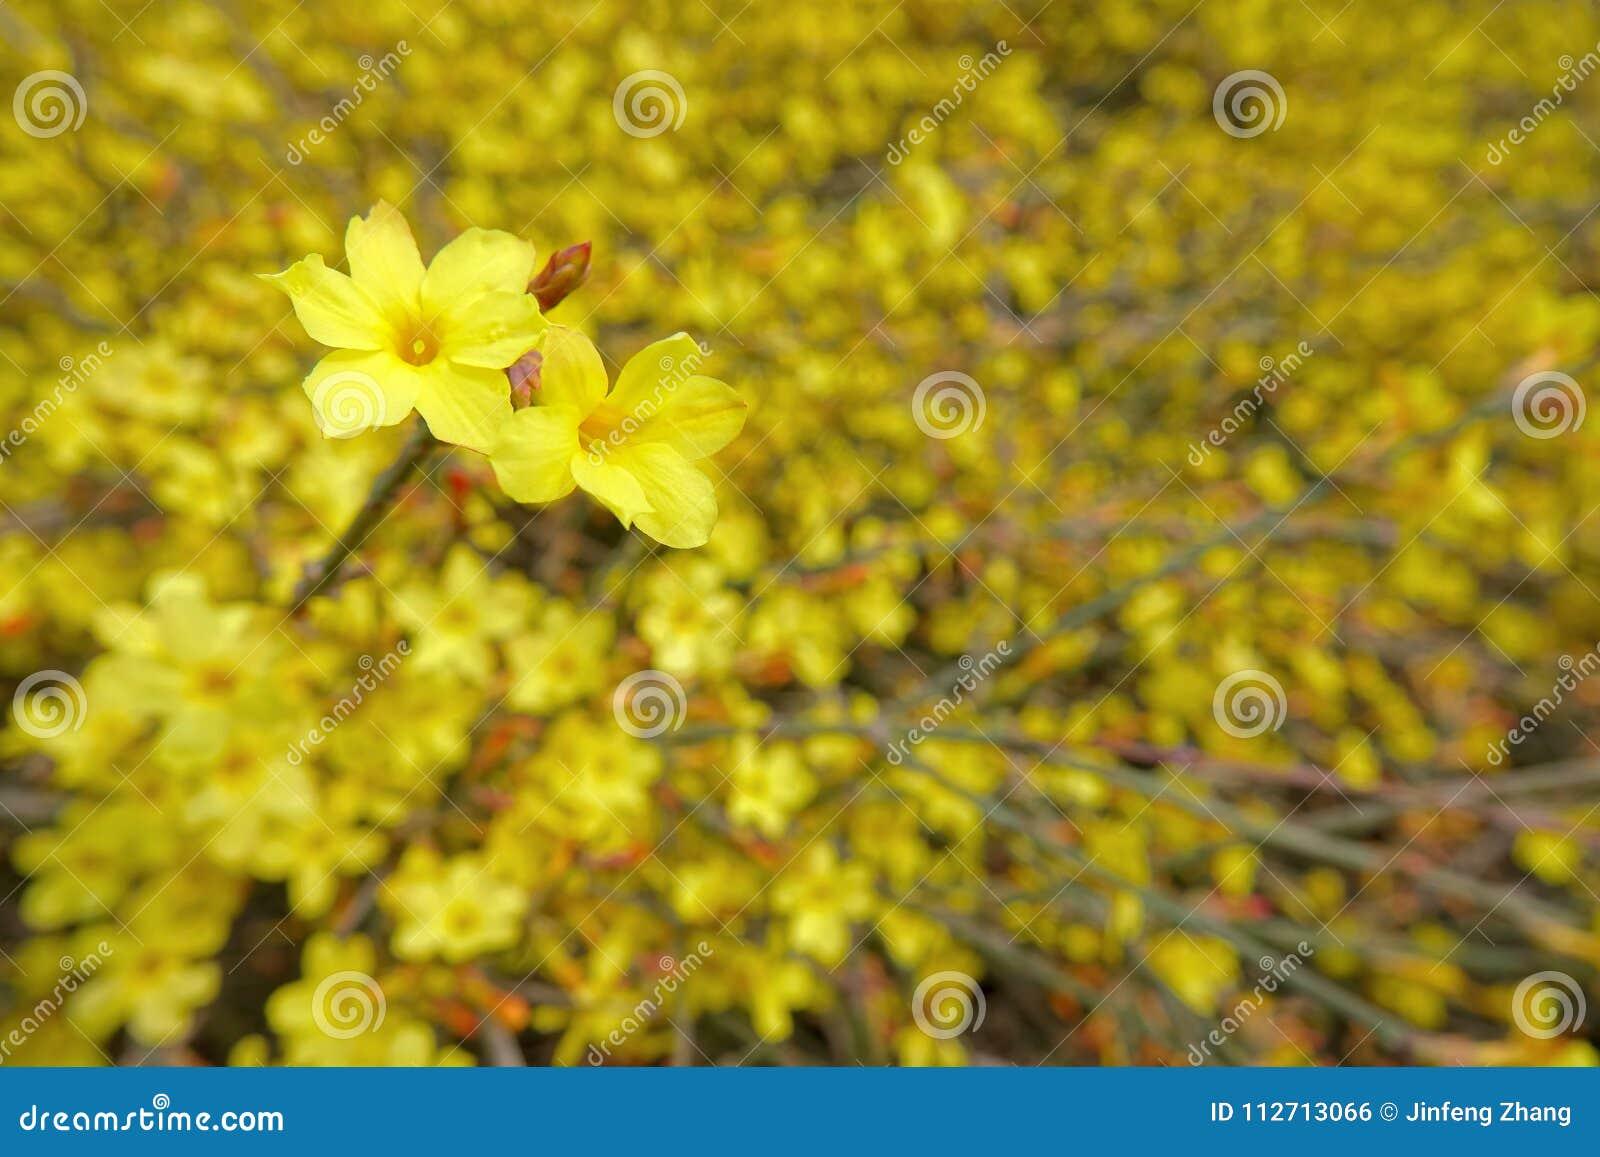 Winter jasmine flower stock photo image of yellow flowers 112713066 winter jasmine flower izmirmasajfo